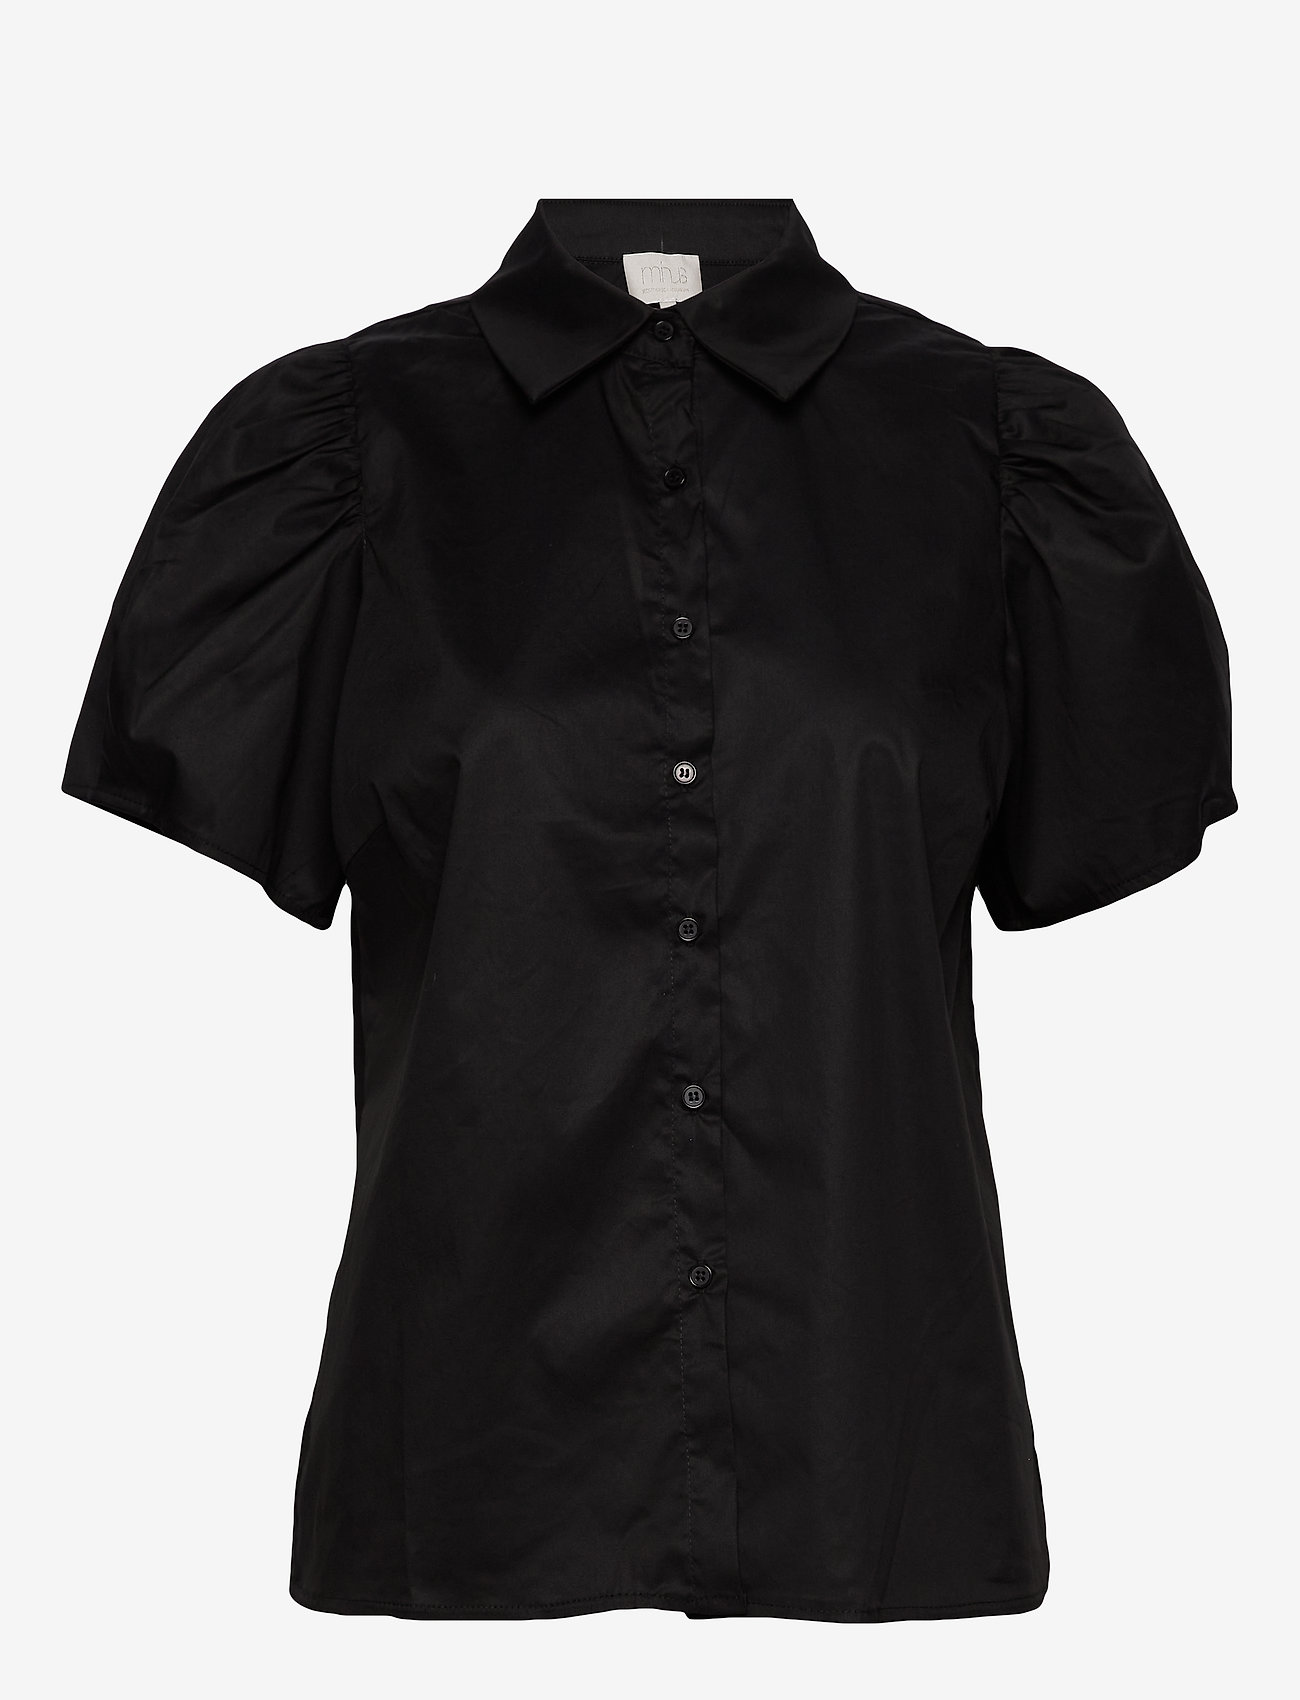 Minus - Elaisa shirt - koszule z krótkim rękawem - sort - 0